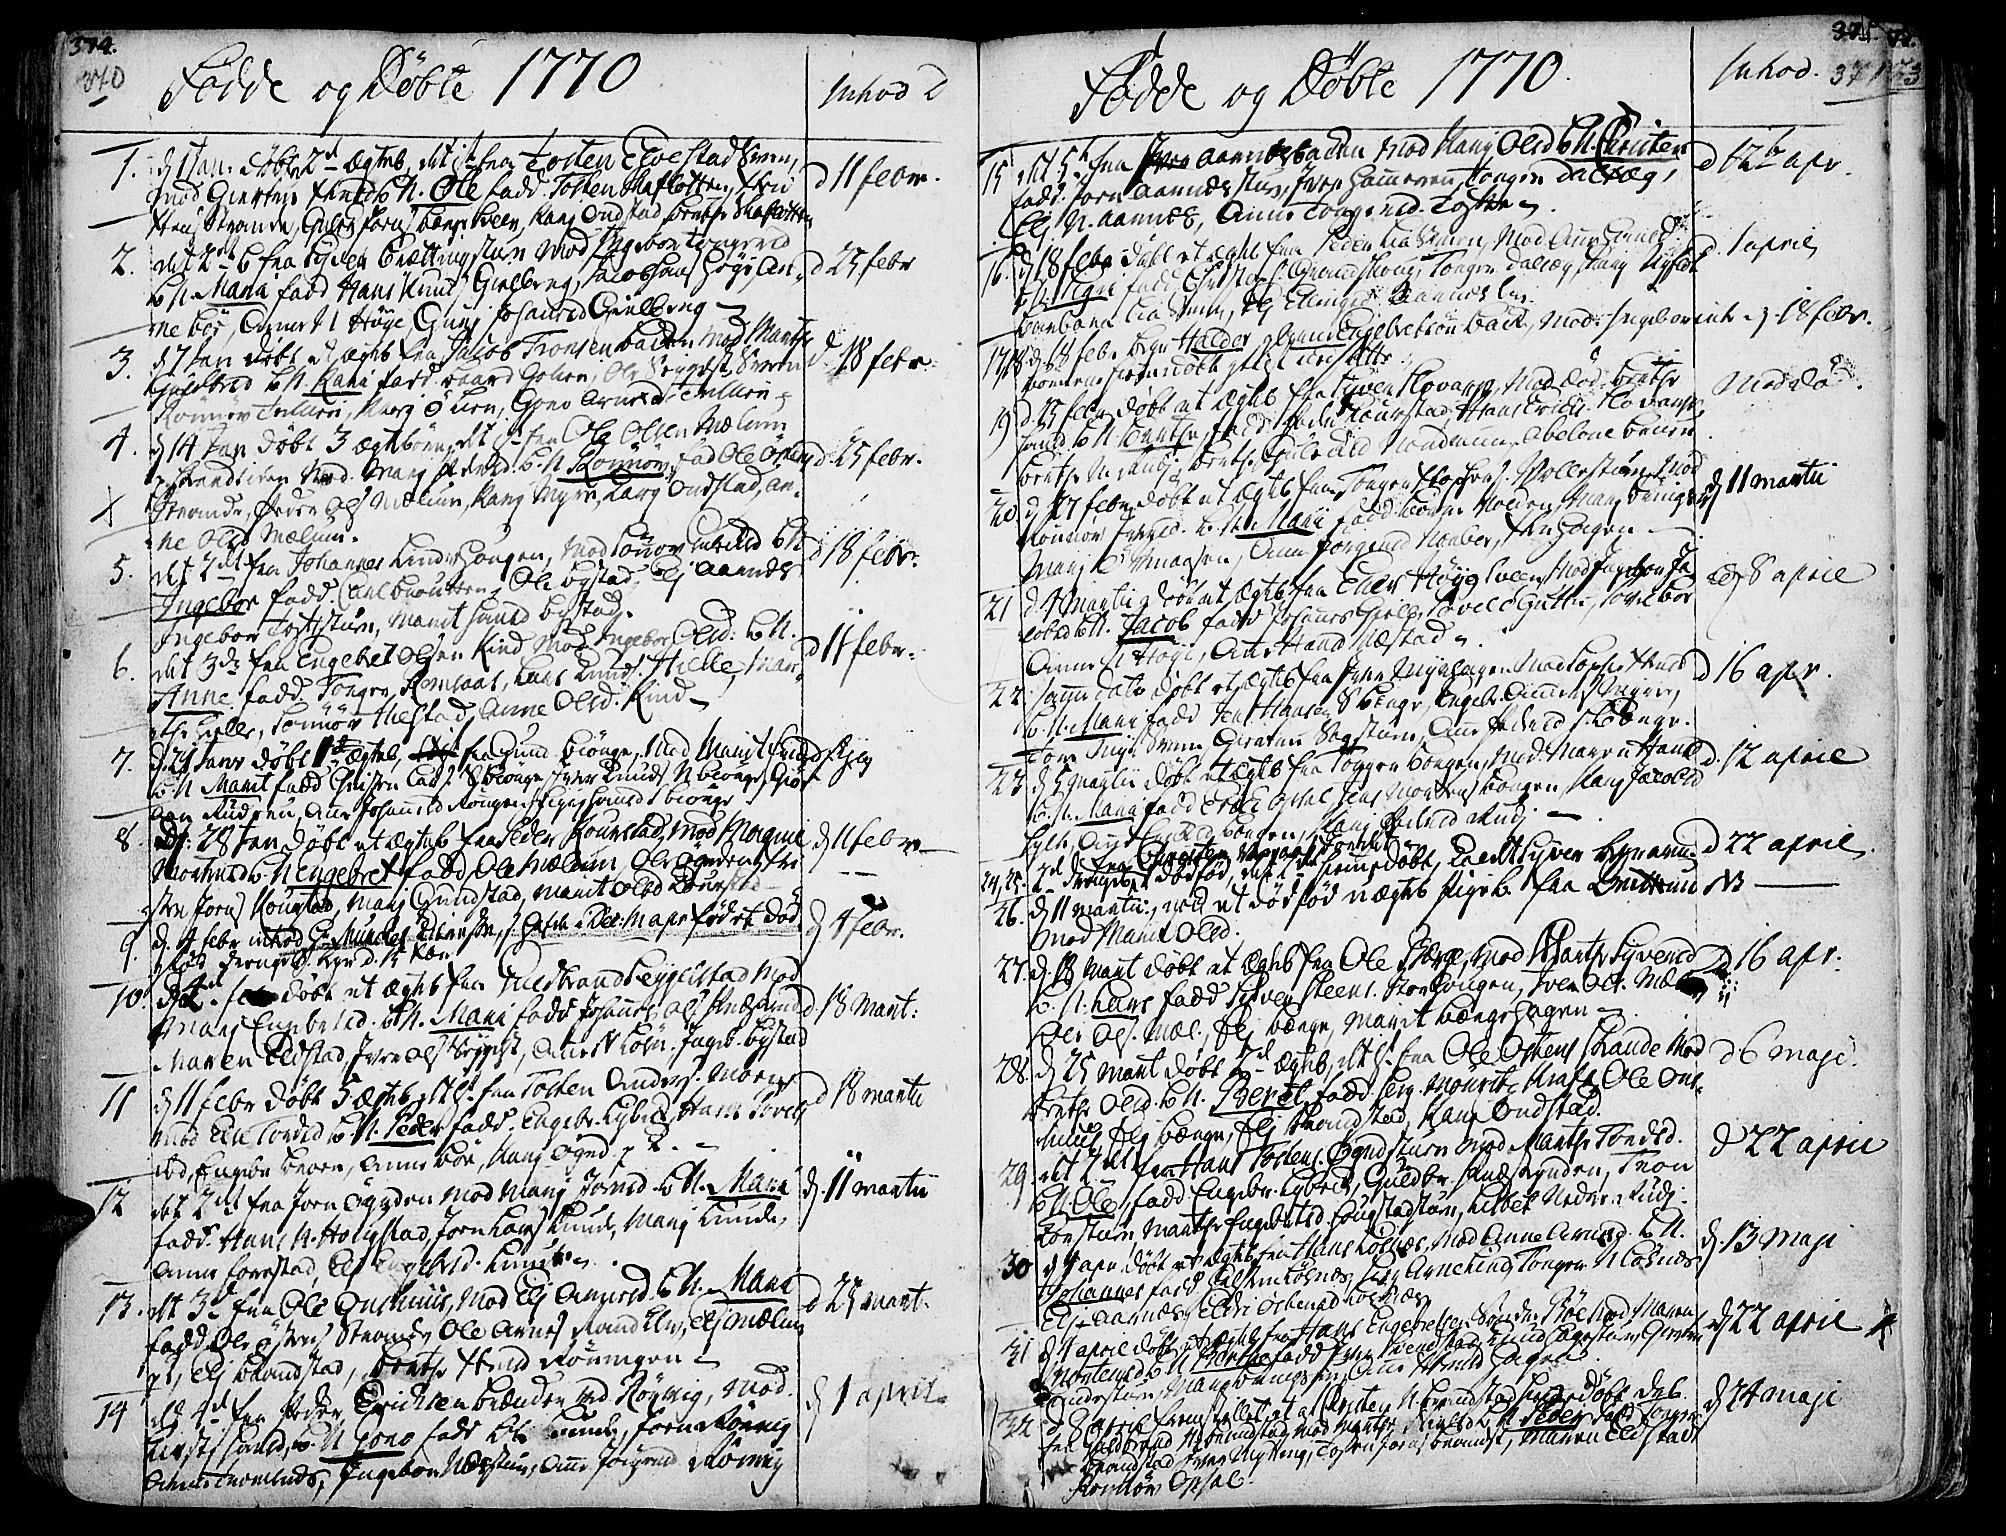 SAH, Ringebu prestekontor, Ministerialbok nr. 2, 1734-1780, s. 370-371